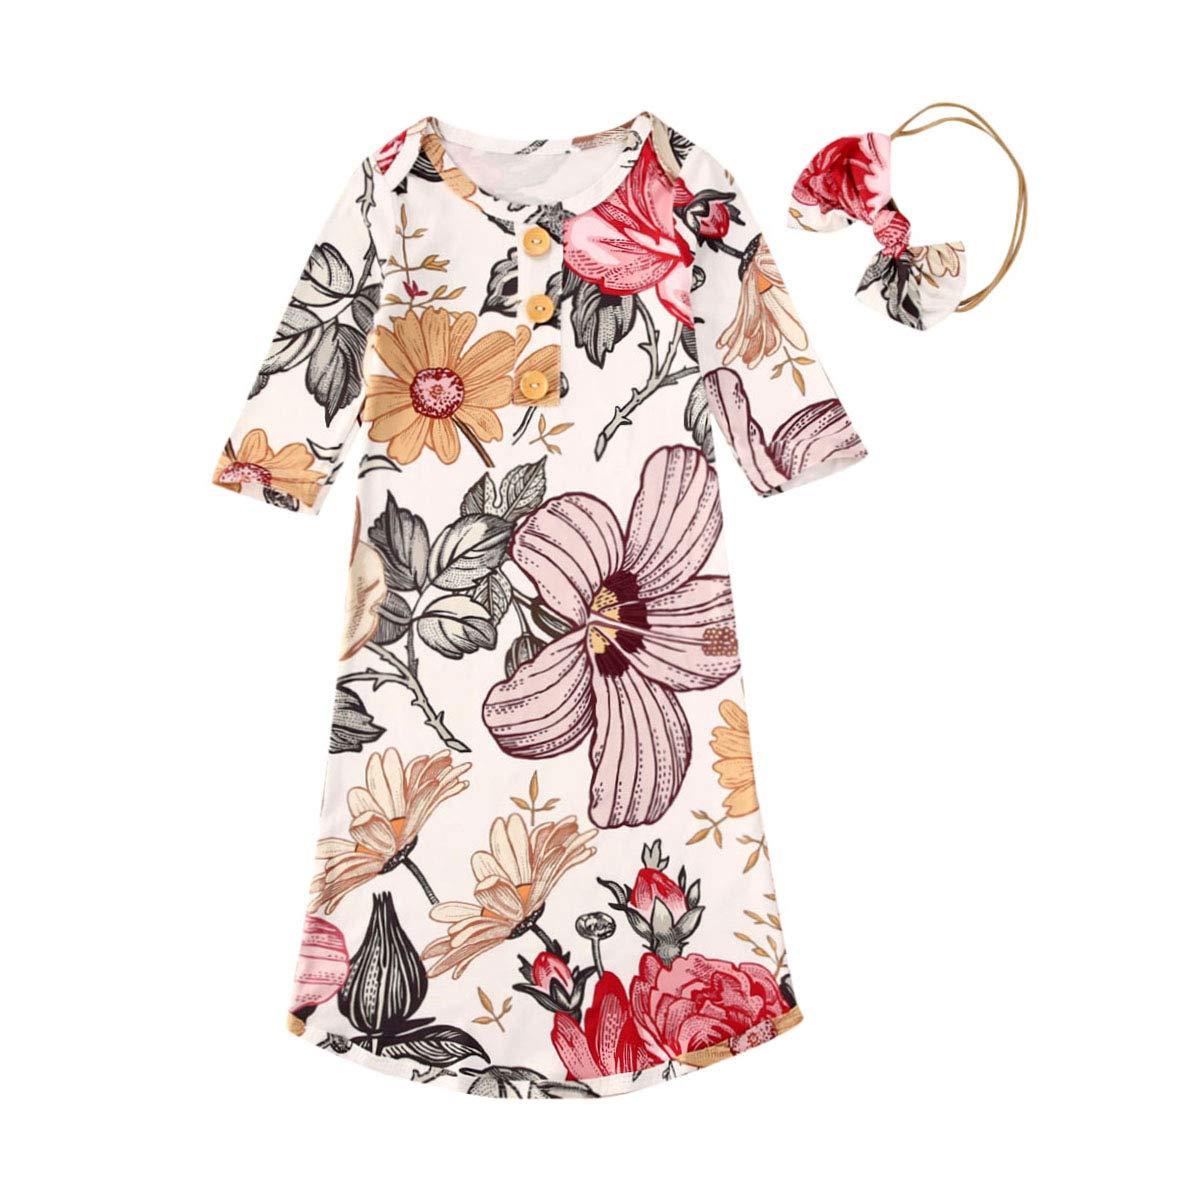 2Pcs Unisex Newborn Baby Girl Floral Long Sleeve Sleepwear Nightgown Romper Sleeping Bag+Headband Outfits Set (Floral Sleeping Bag+Headband,0-3 Months)